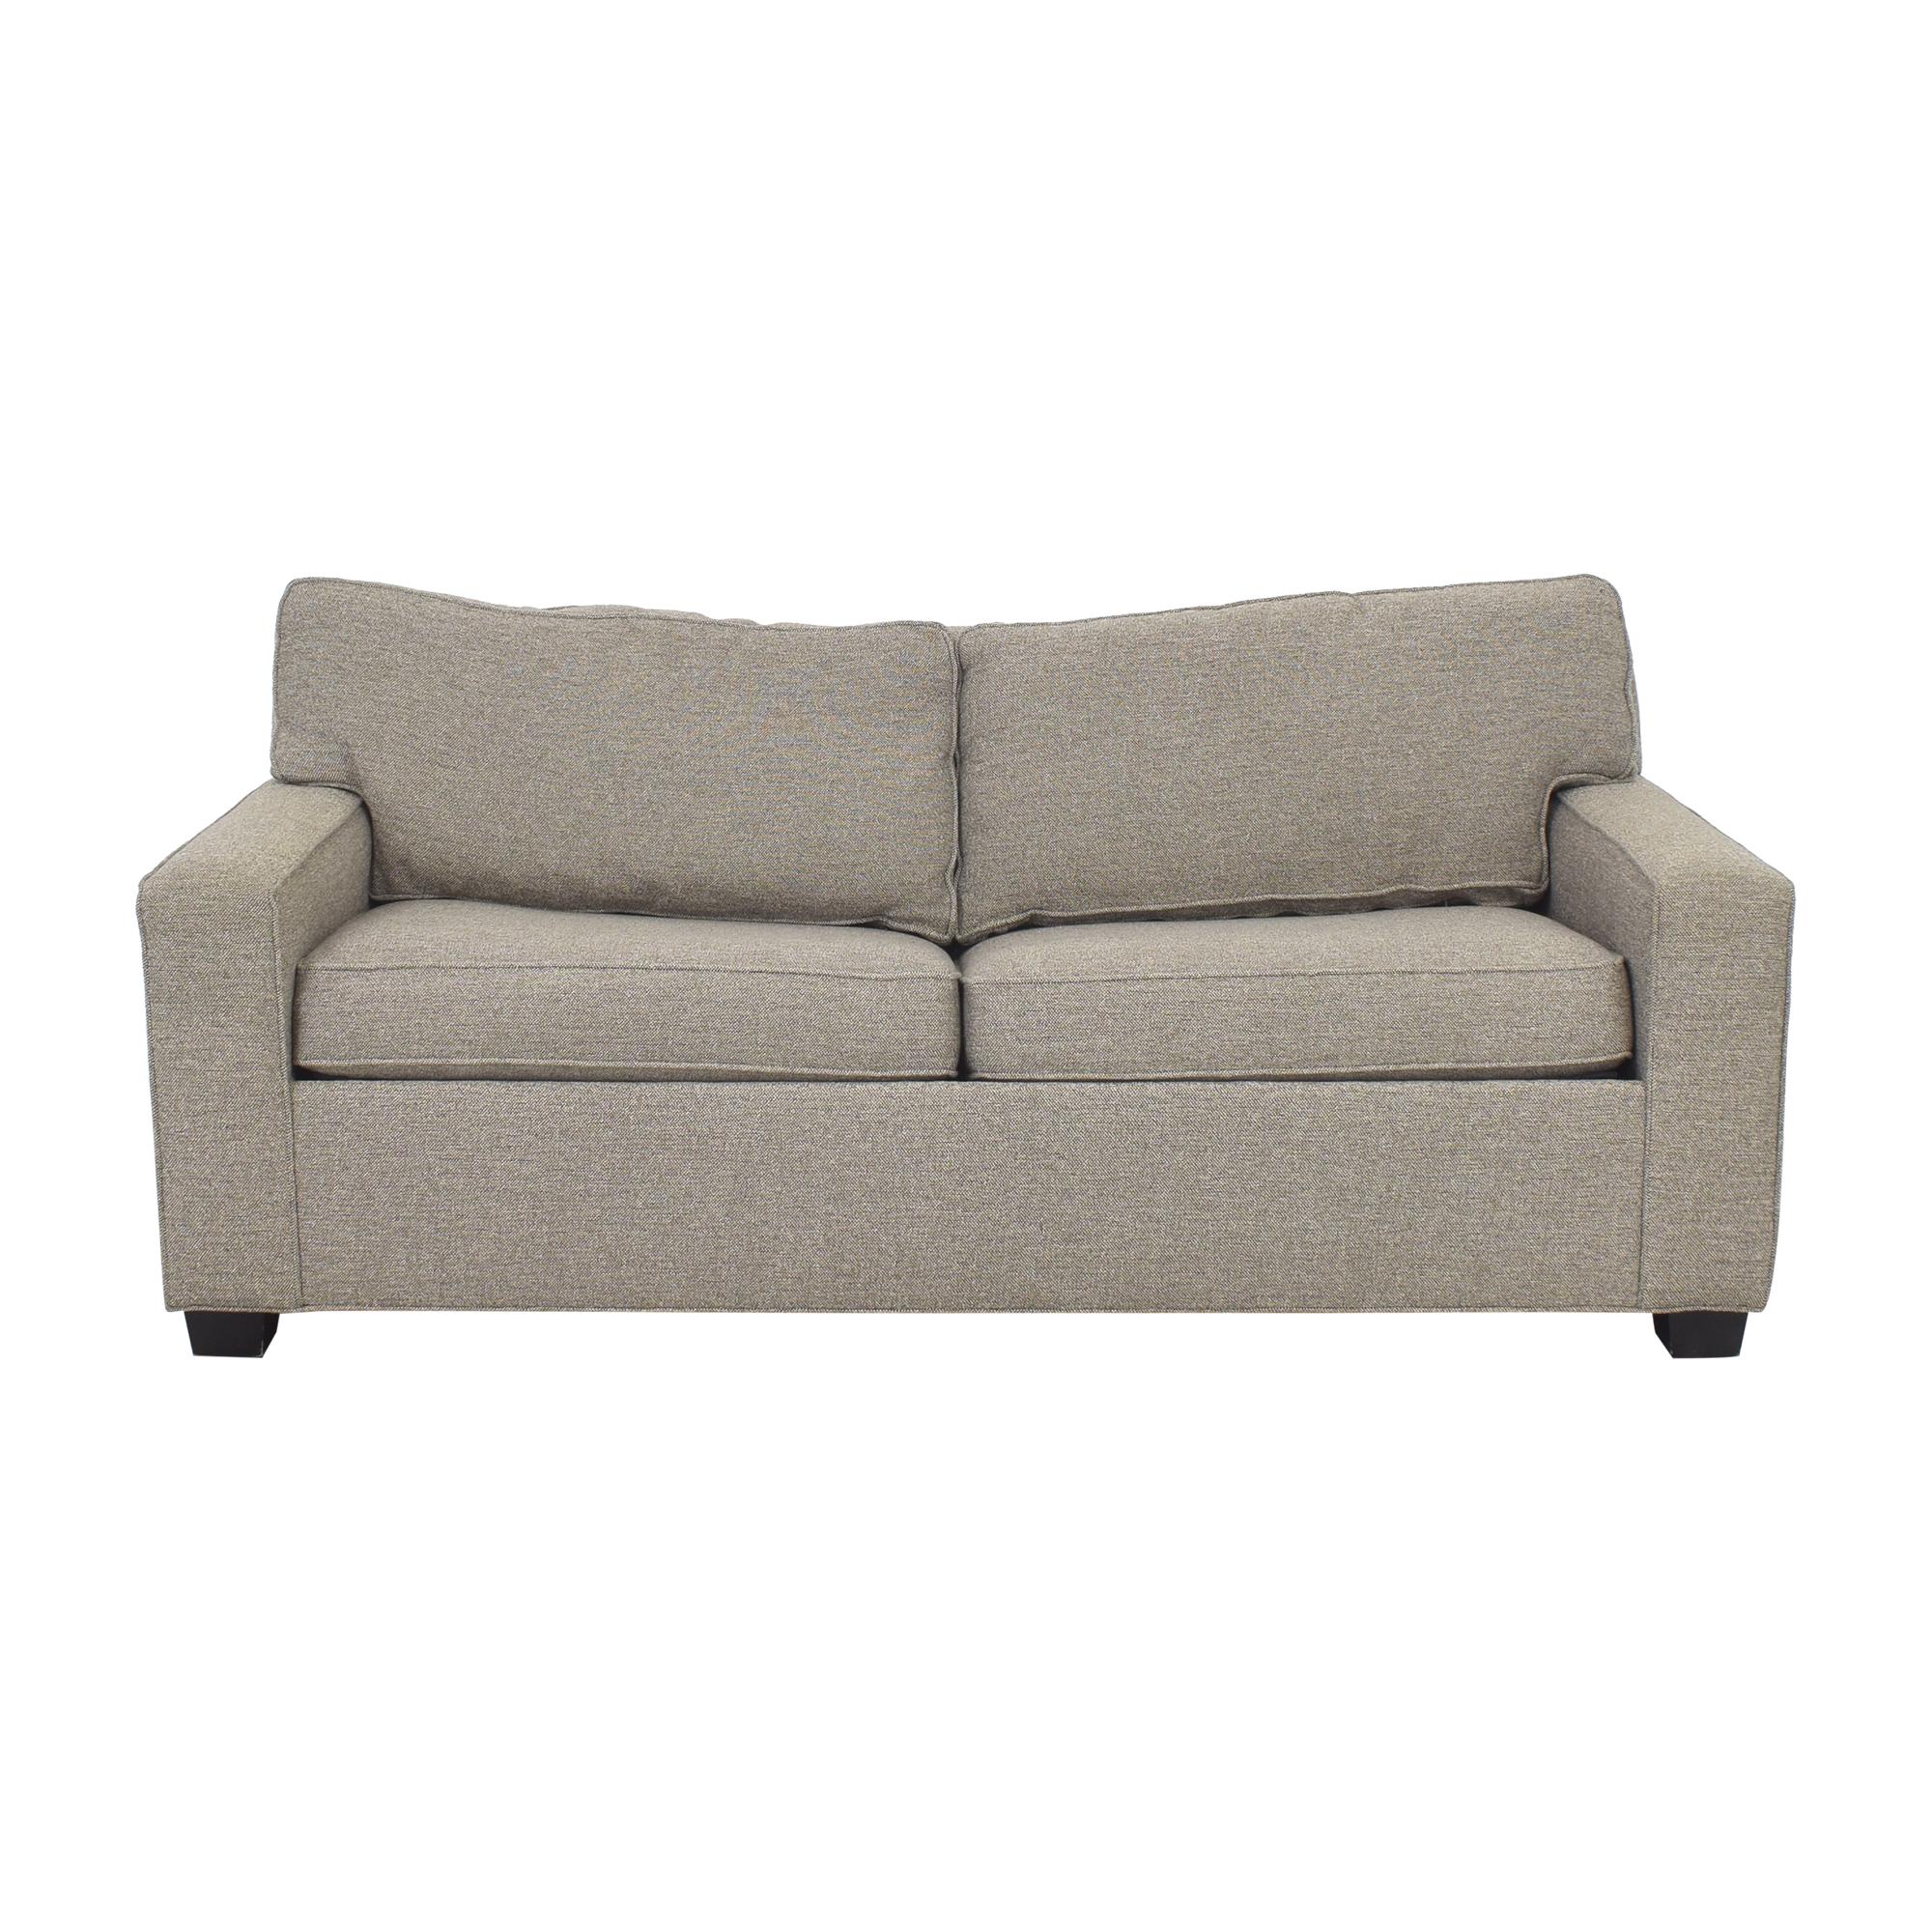 Mitchell Gold + Bob Williams Mitchell Gold + Bob Williams Queen Sleeper Sofa ct